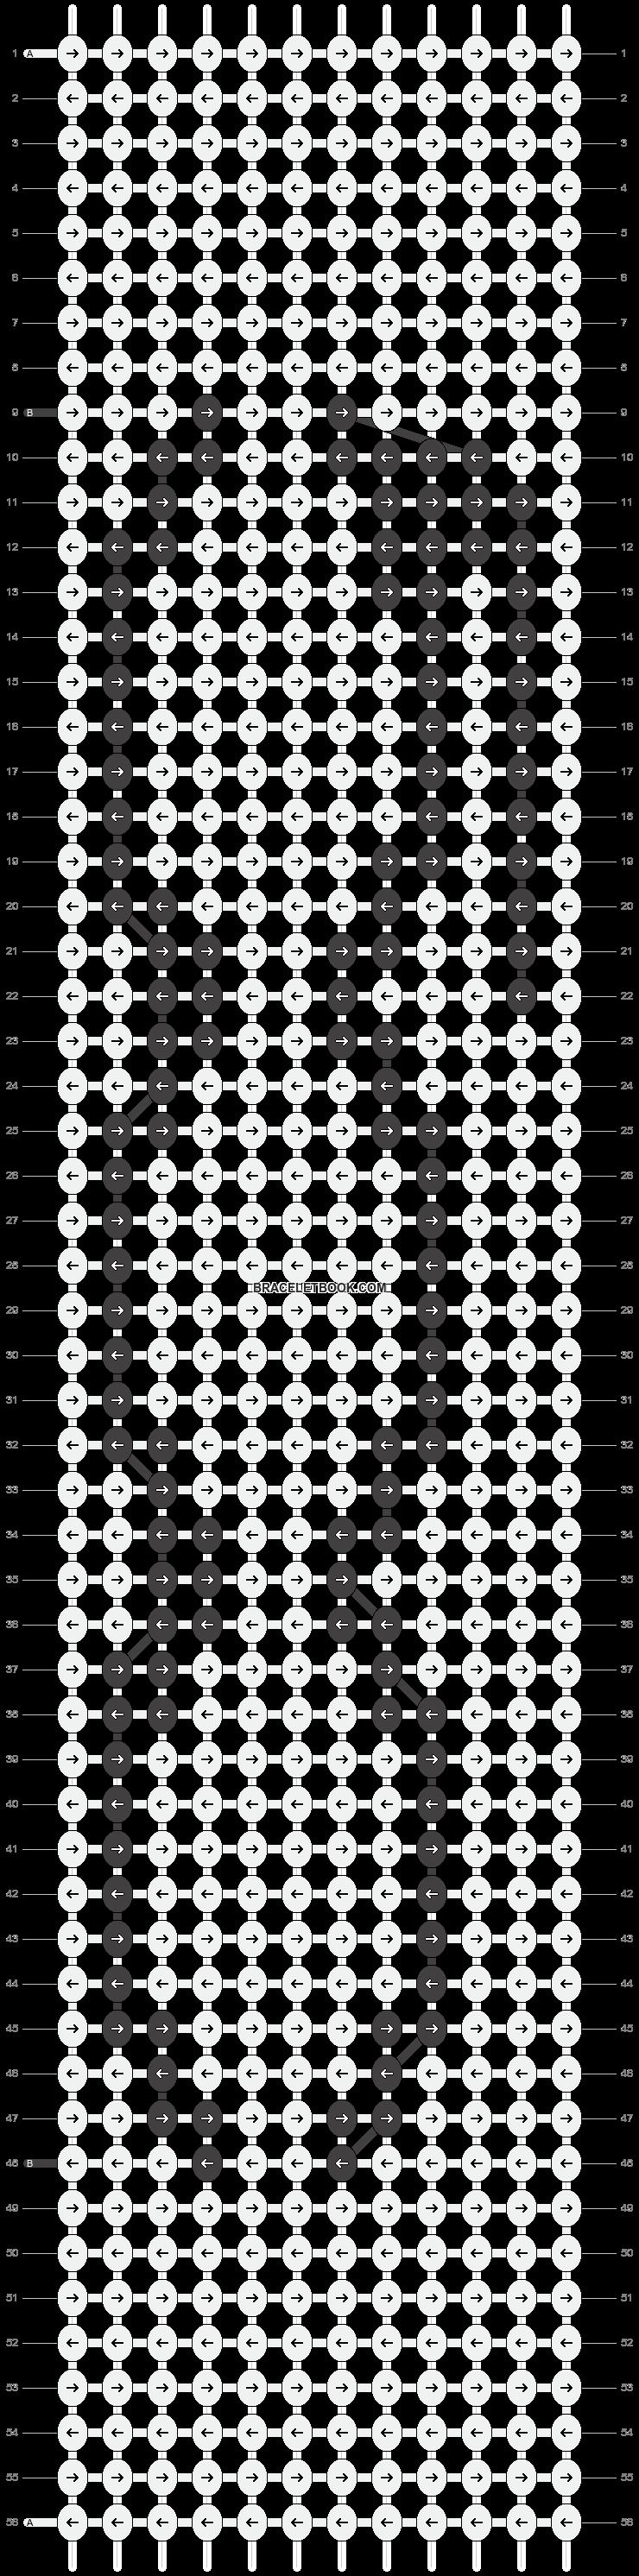 Alpha pattern #20913 pattern